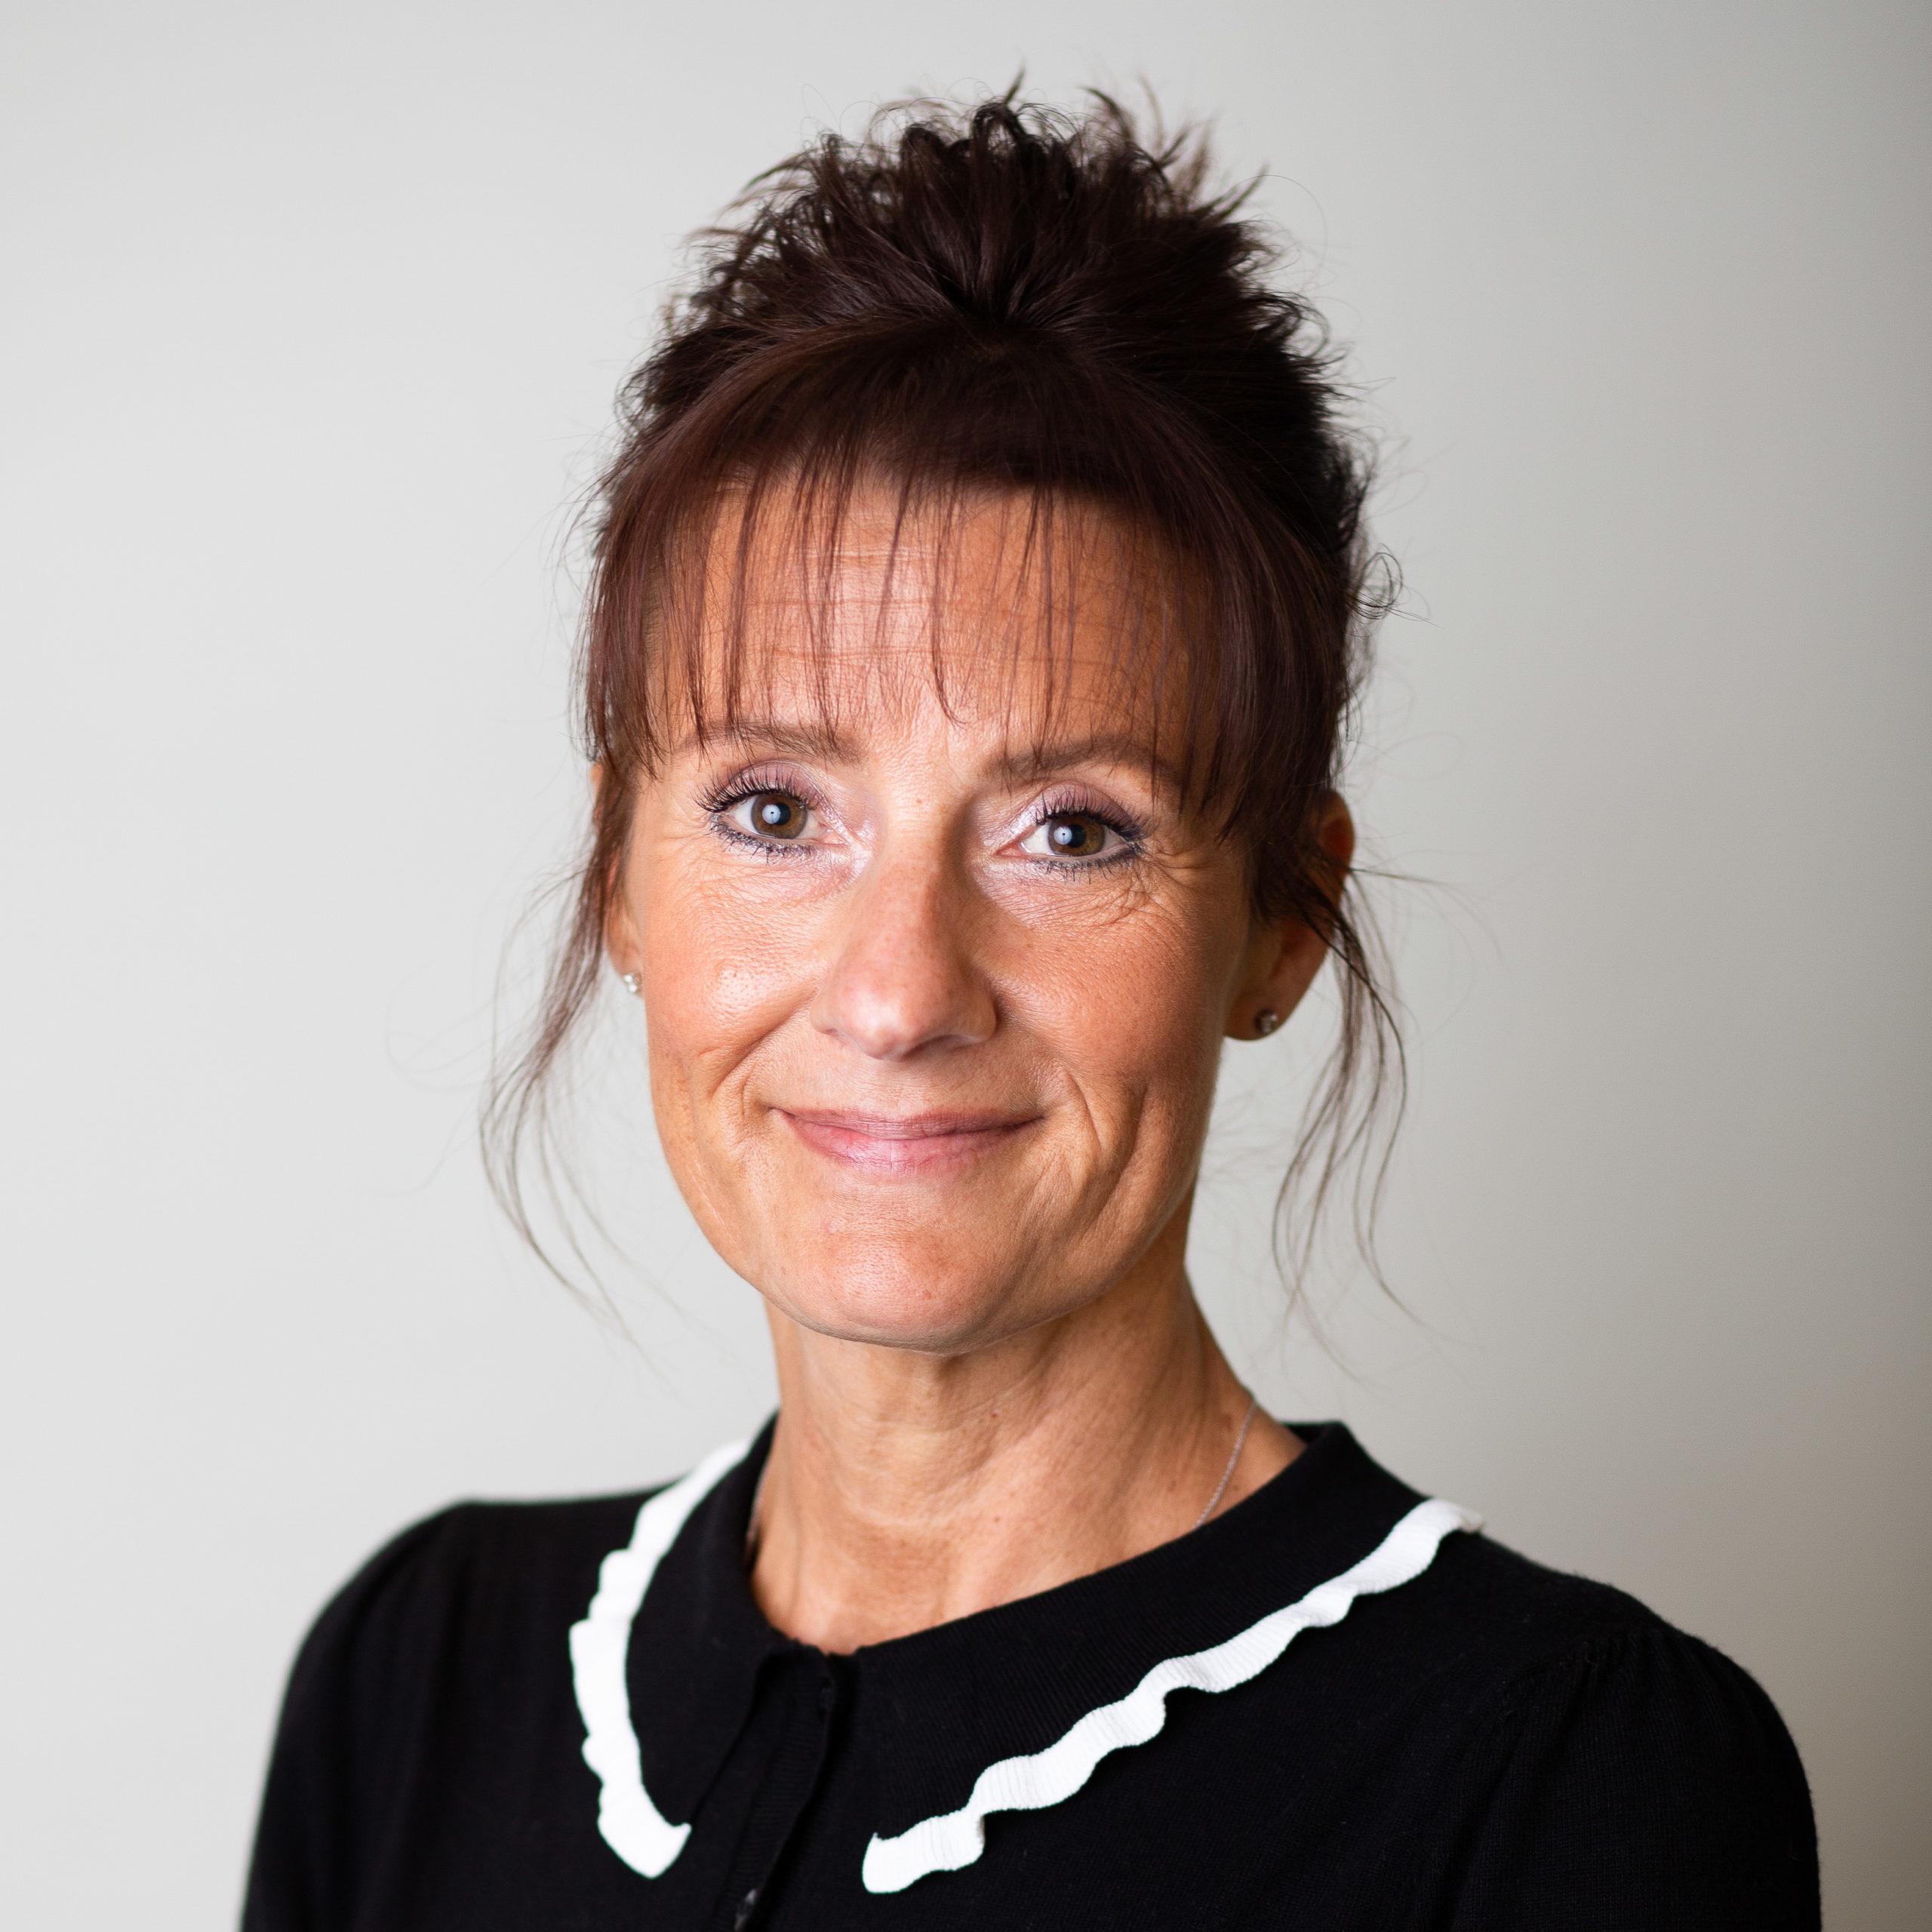 Alison McQuillan